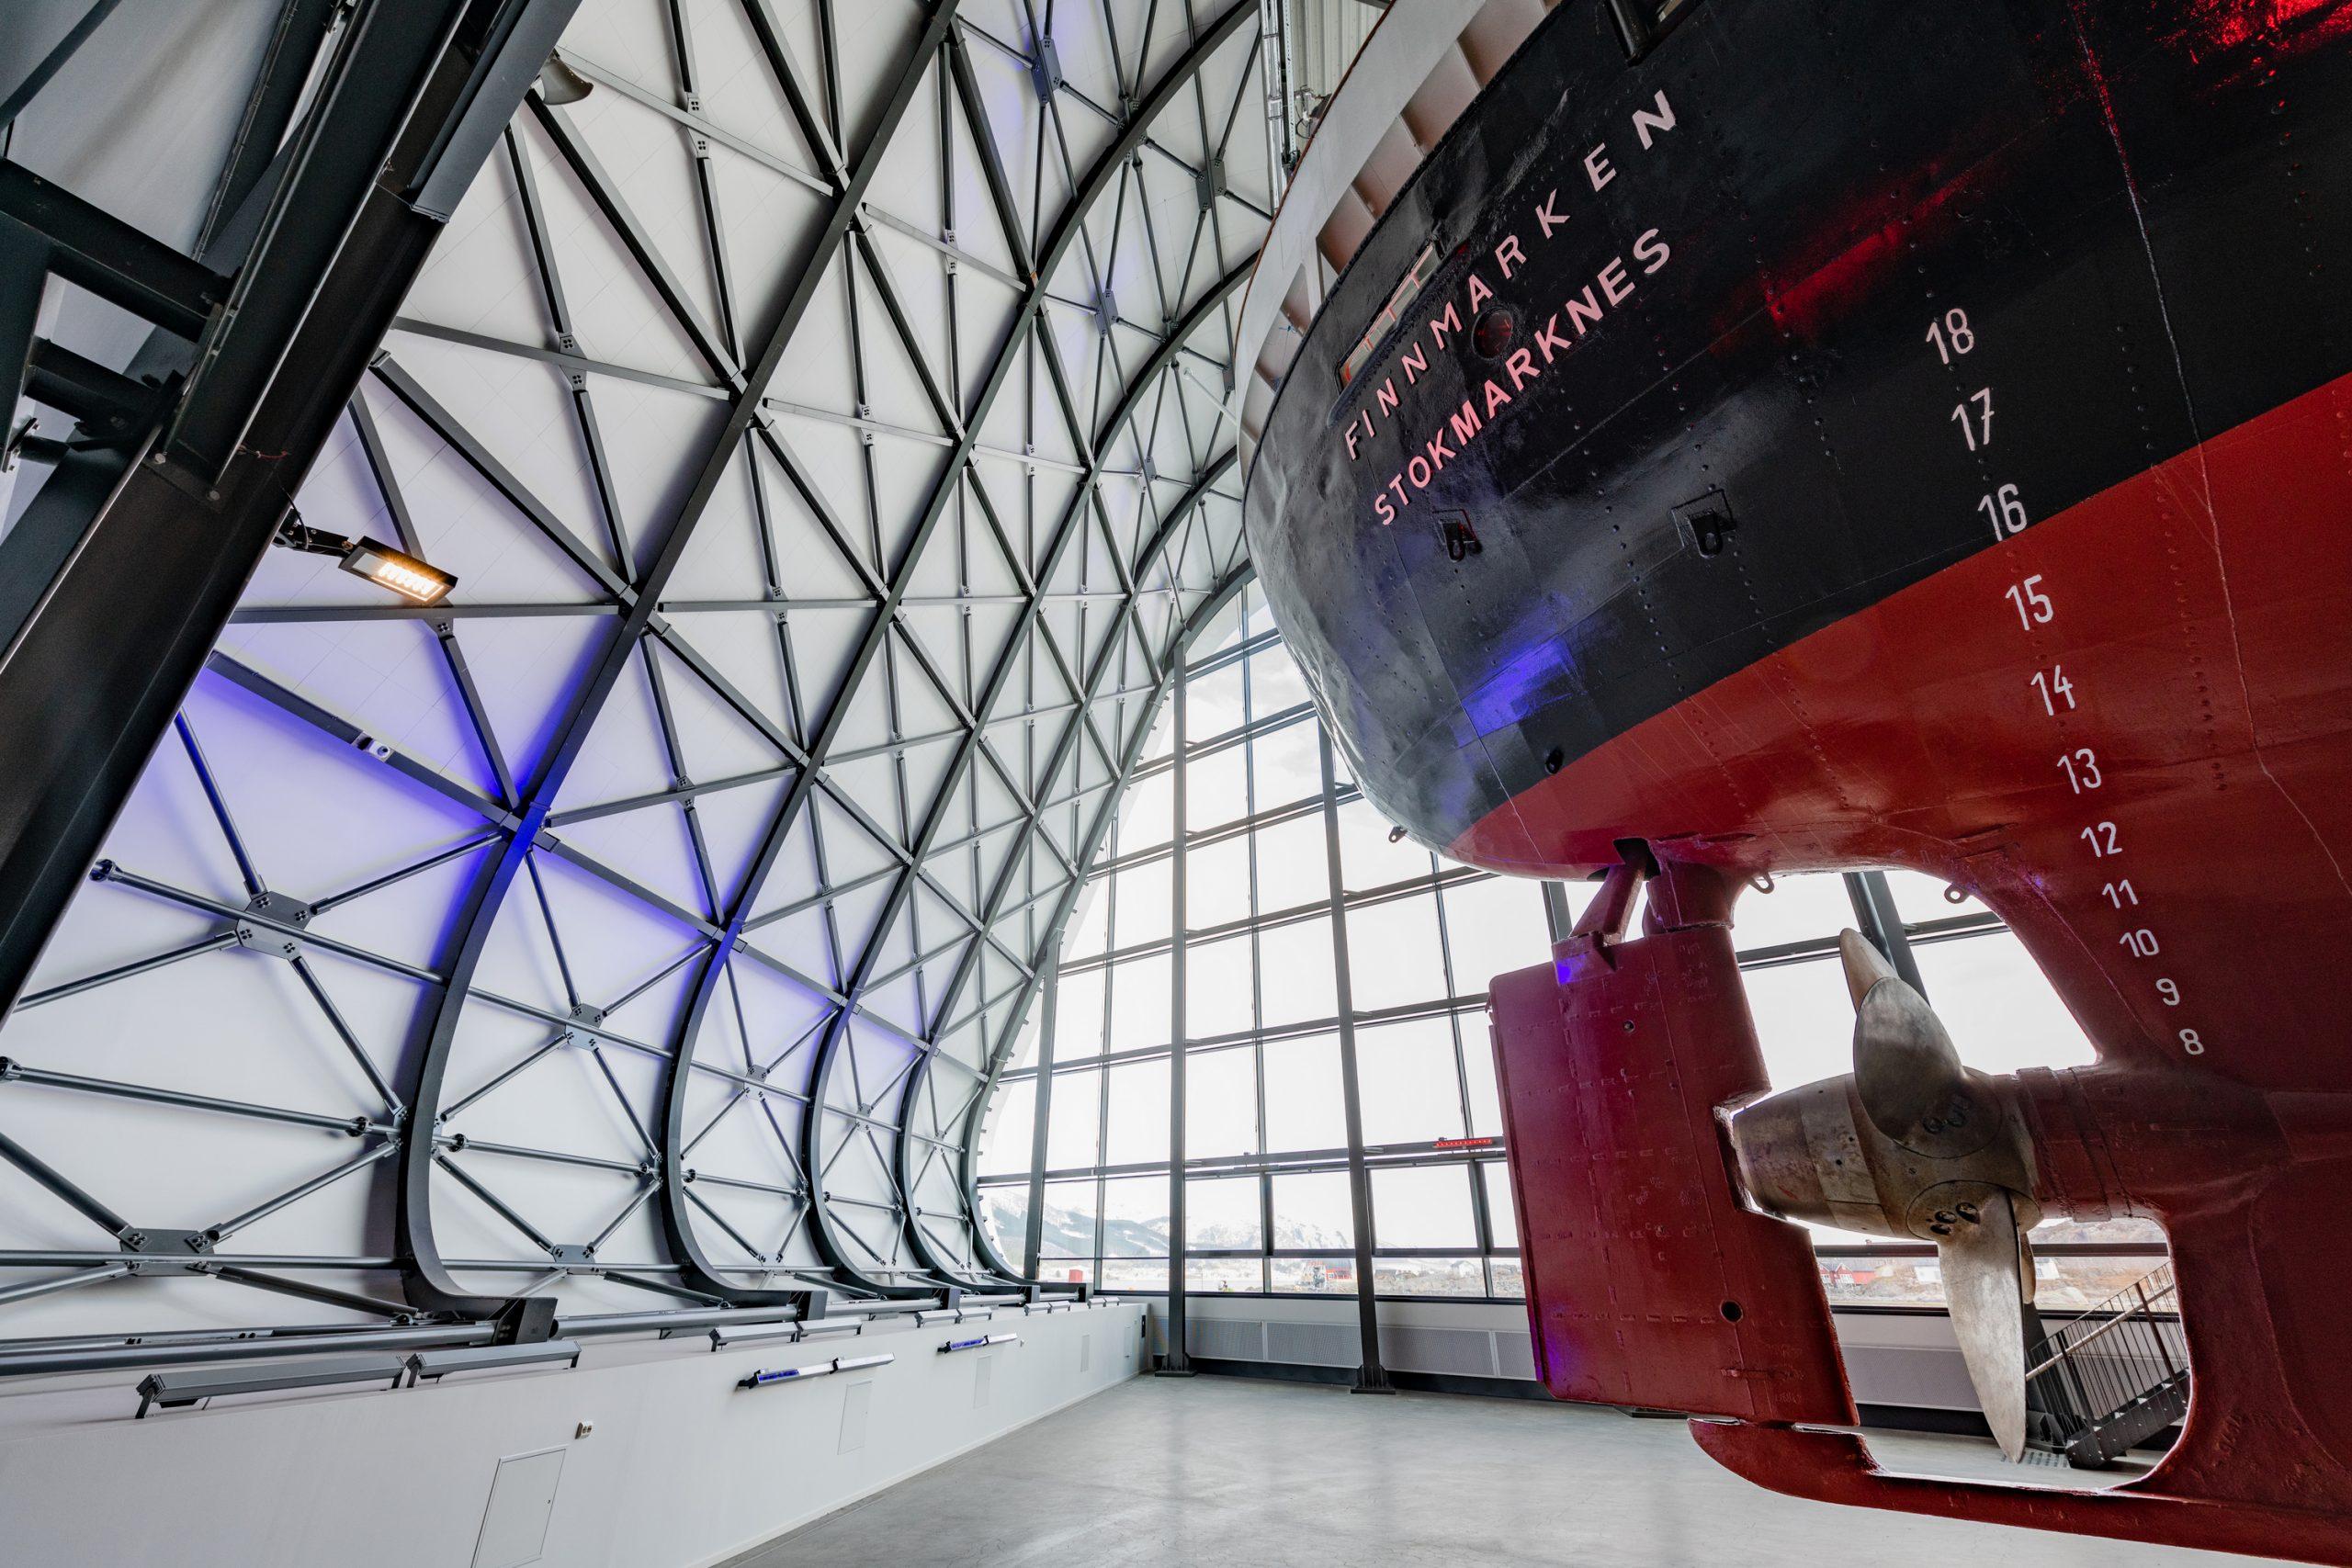 Hurtigruten Museum Opens On 28 August (August 2021)